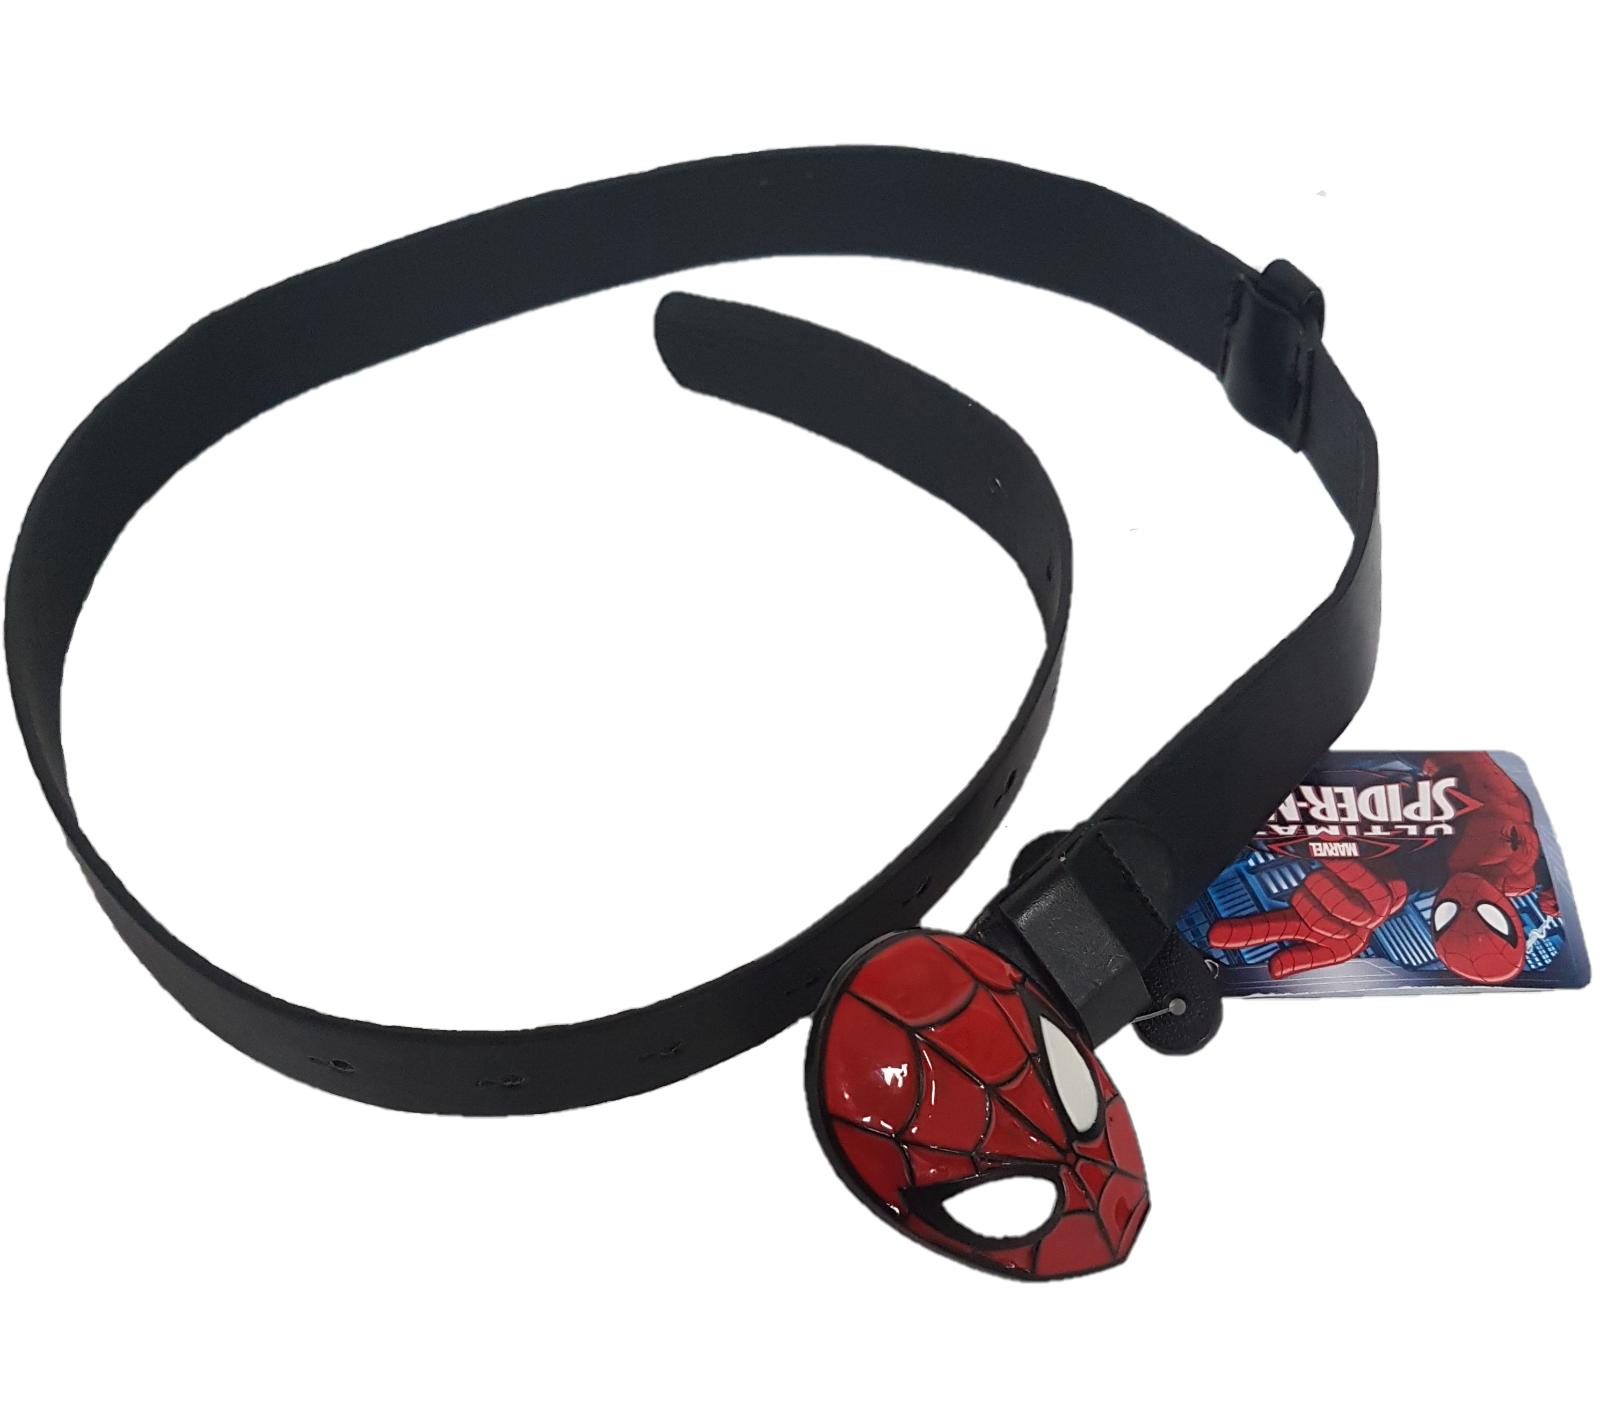 20 x Childs Marvel Spiderman Belt Metal Buckle 4-8 Years